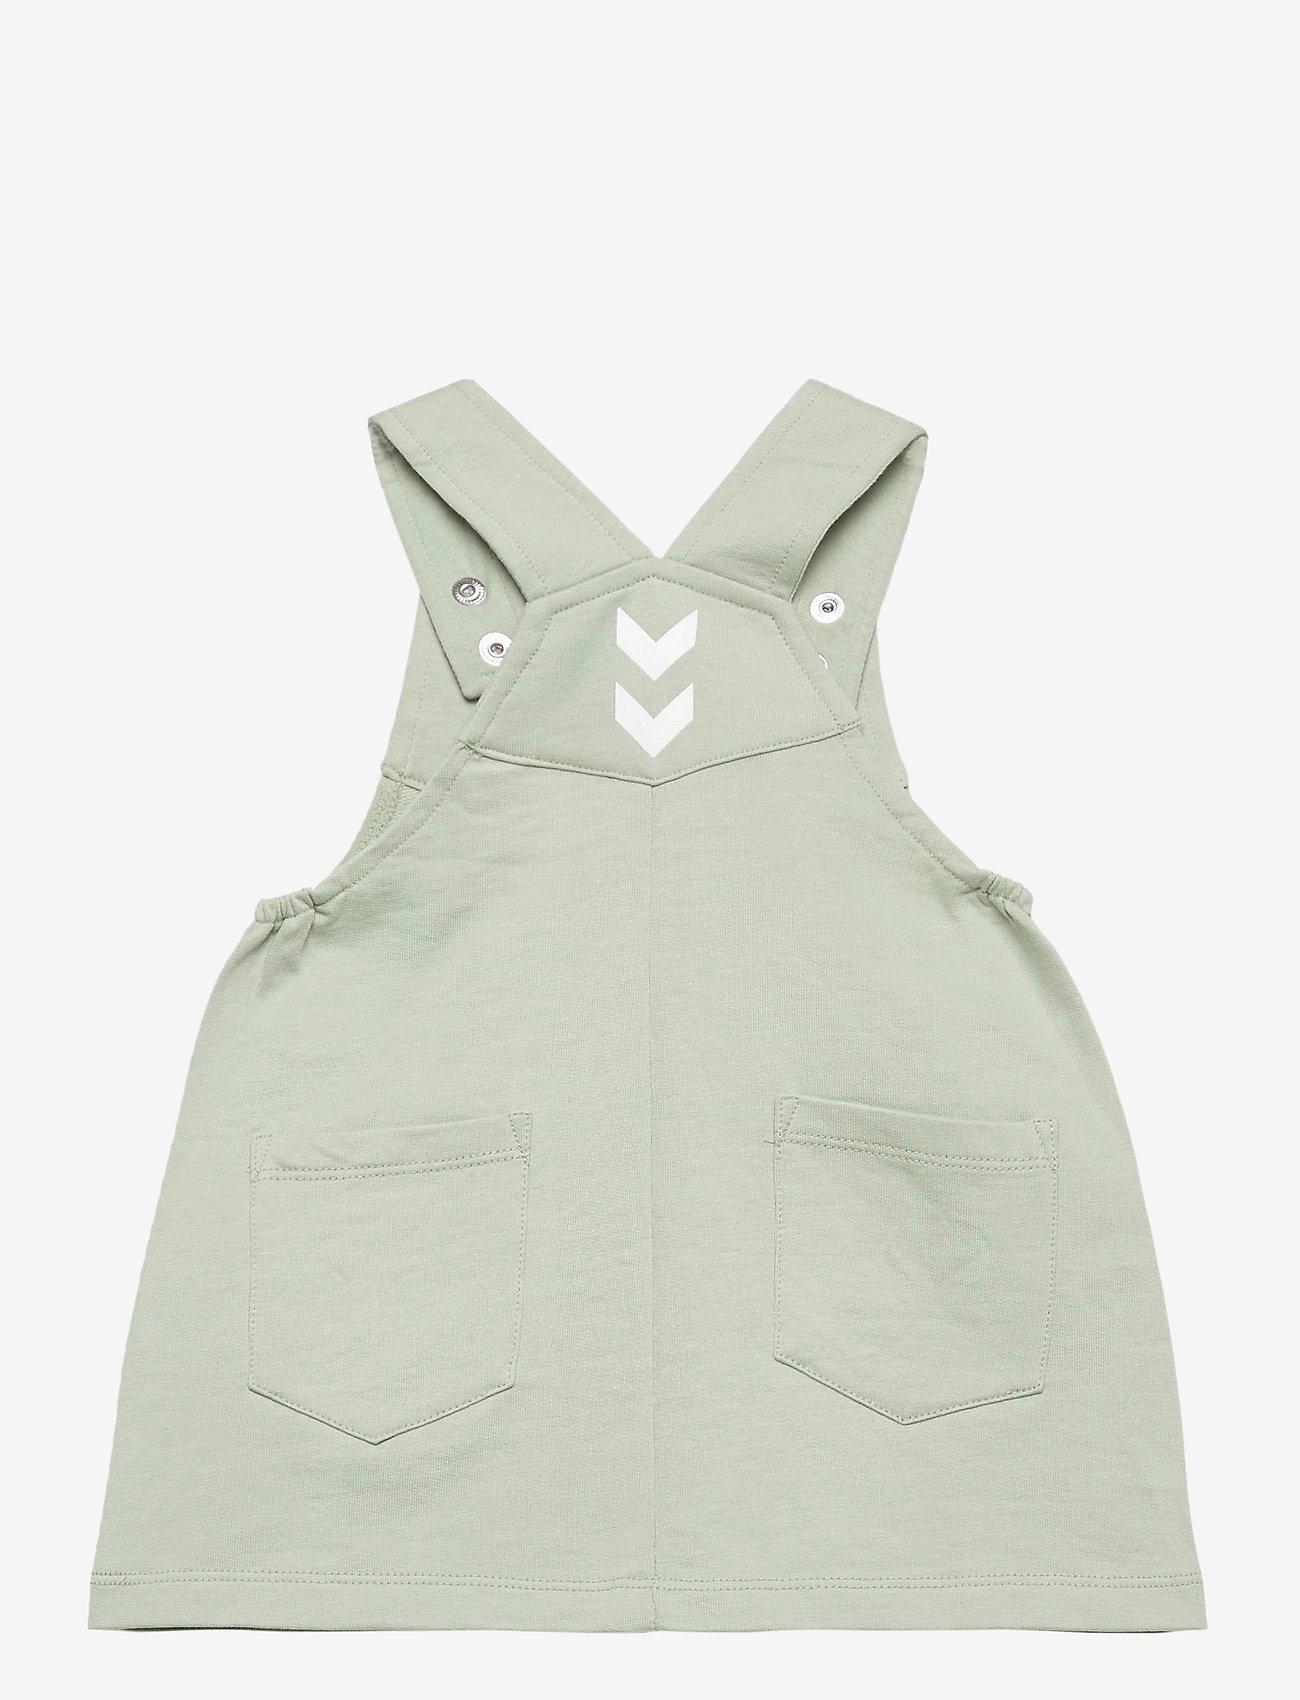 Hummel - hmlELLEN DRESS - kleider - desert sage - 1